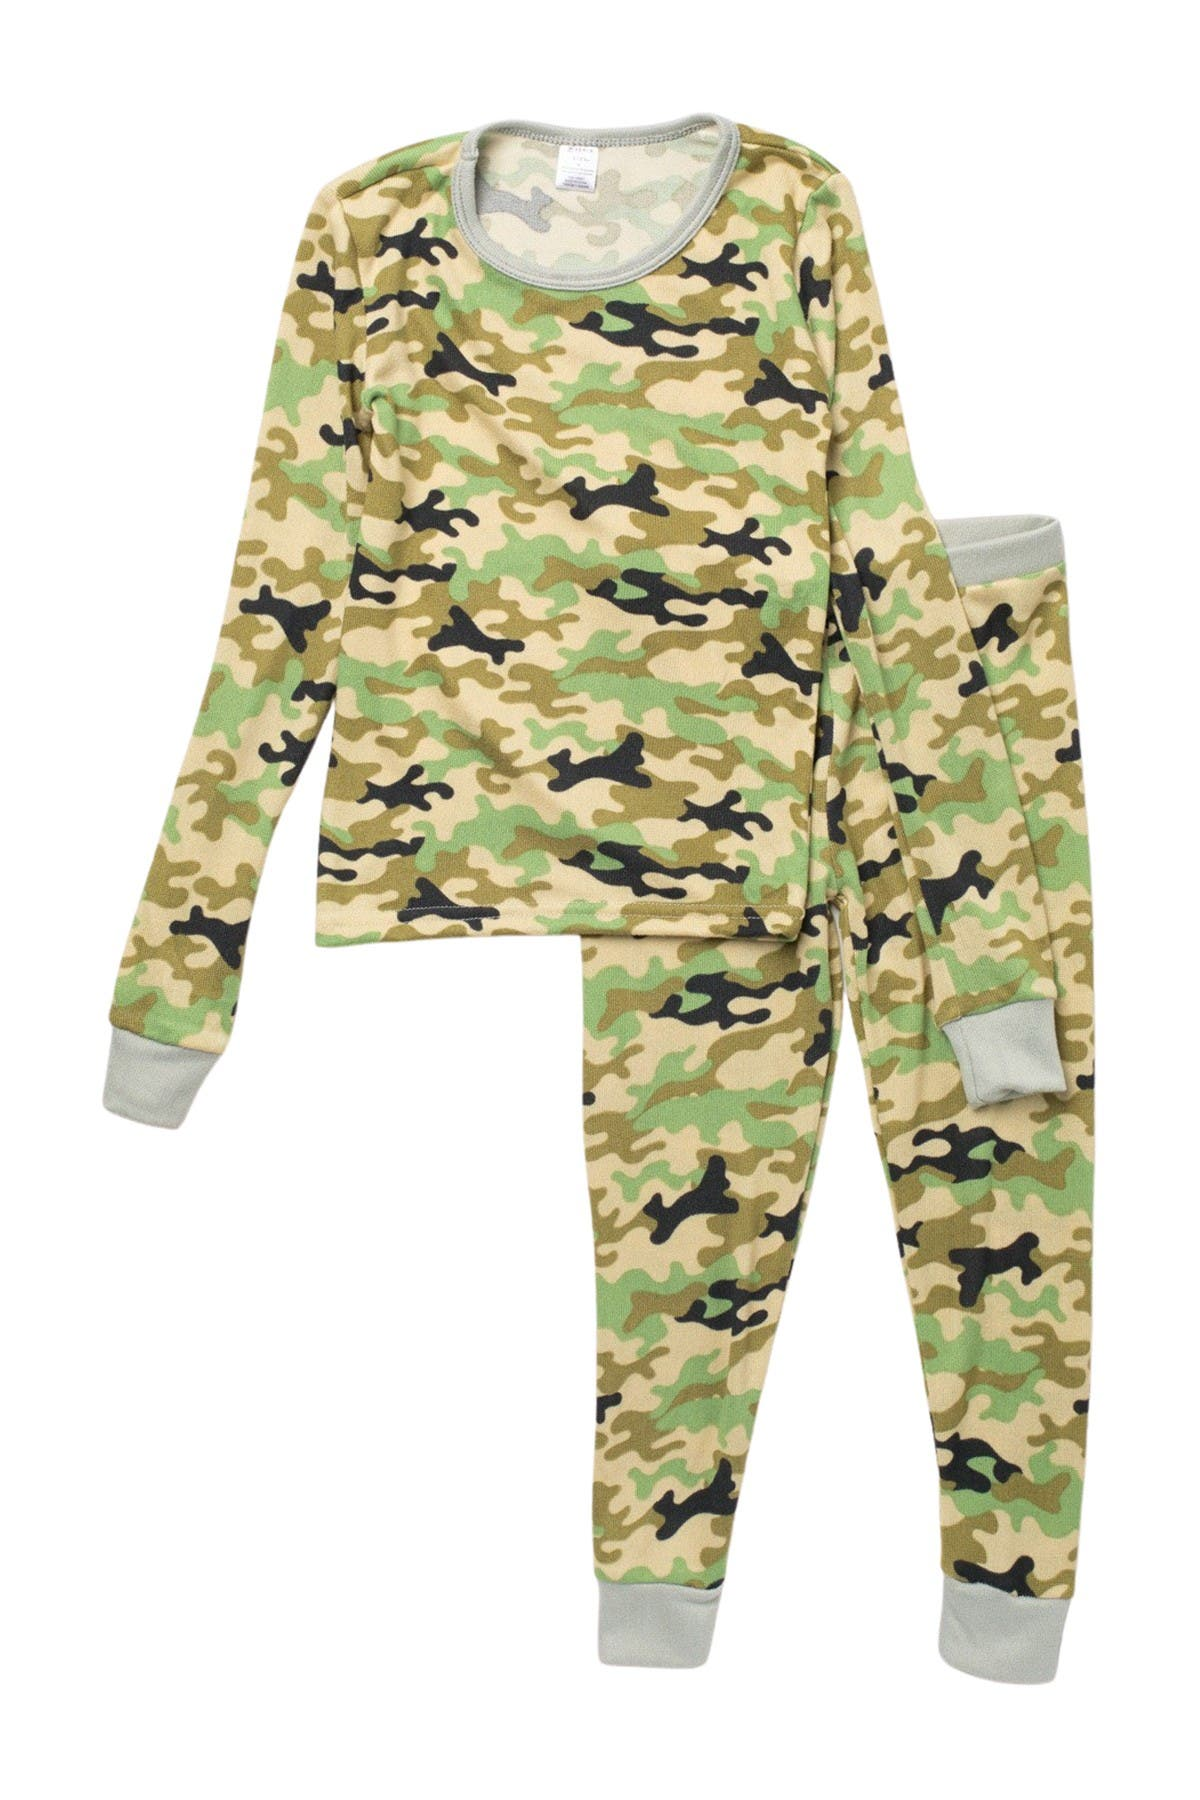 Image of MODERN KIDS Camo Print Long Sleeve Pajamas